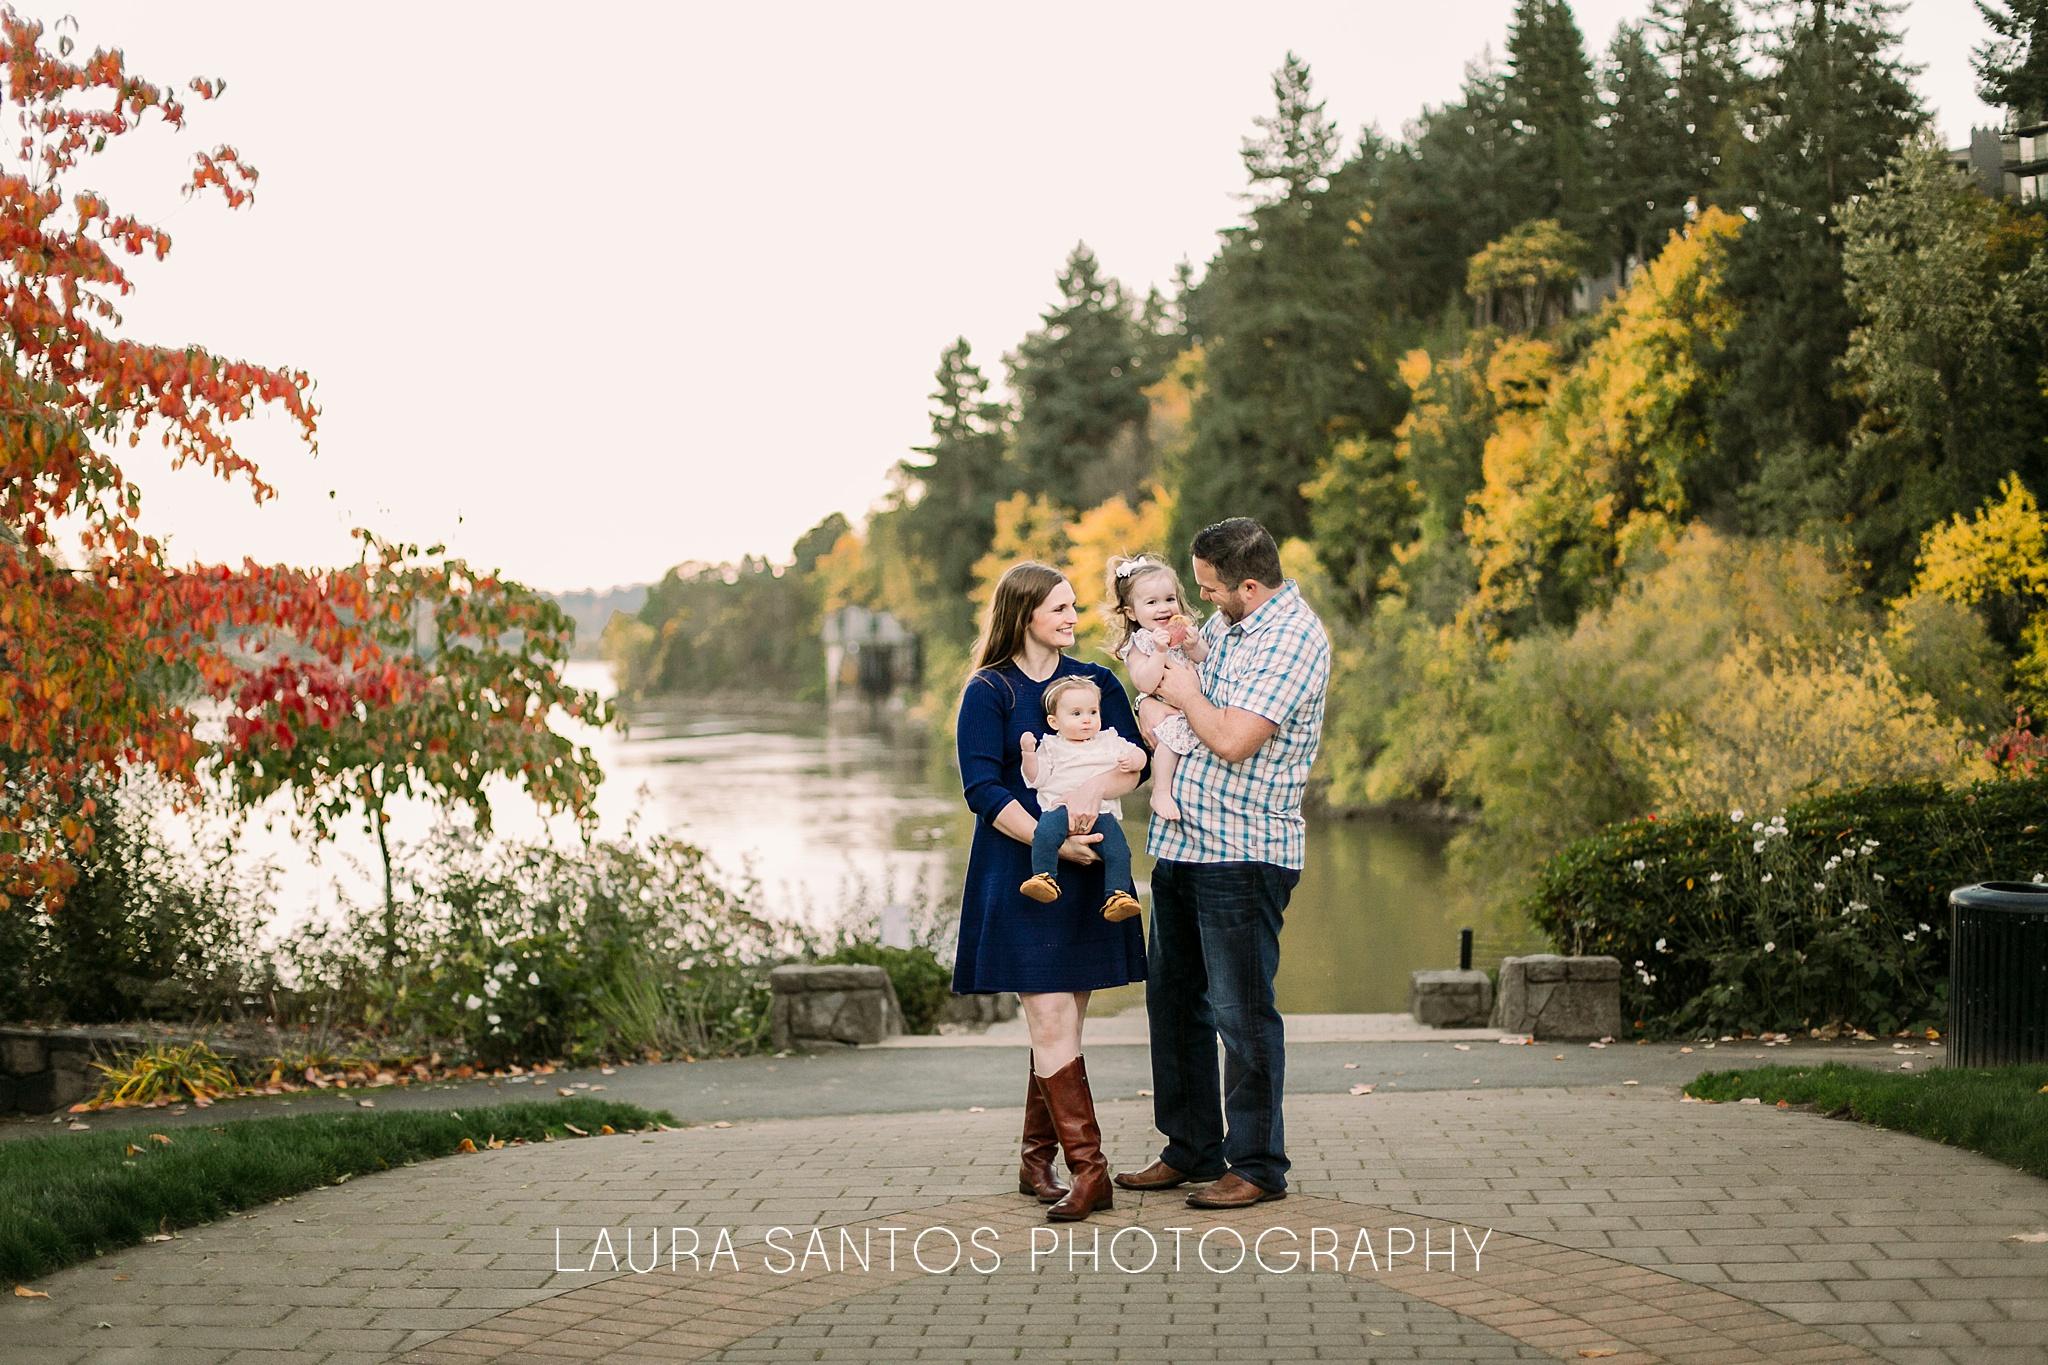 Laura Santos Photography Portland Oregon Family Photographer_0510.jpg